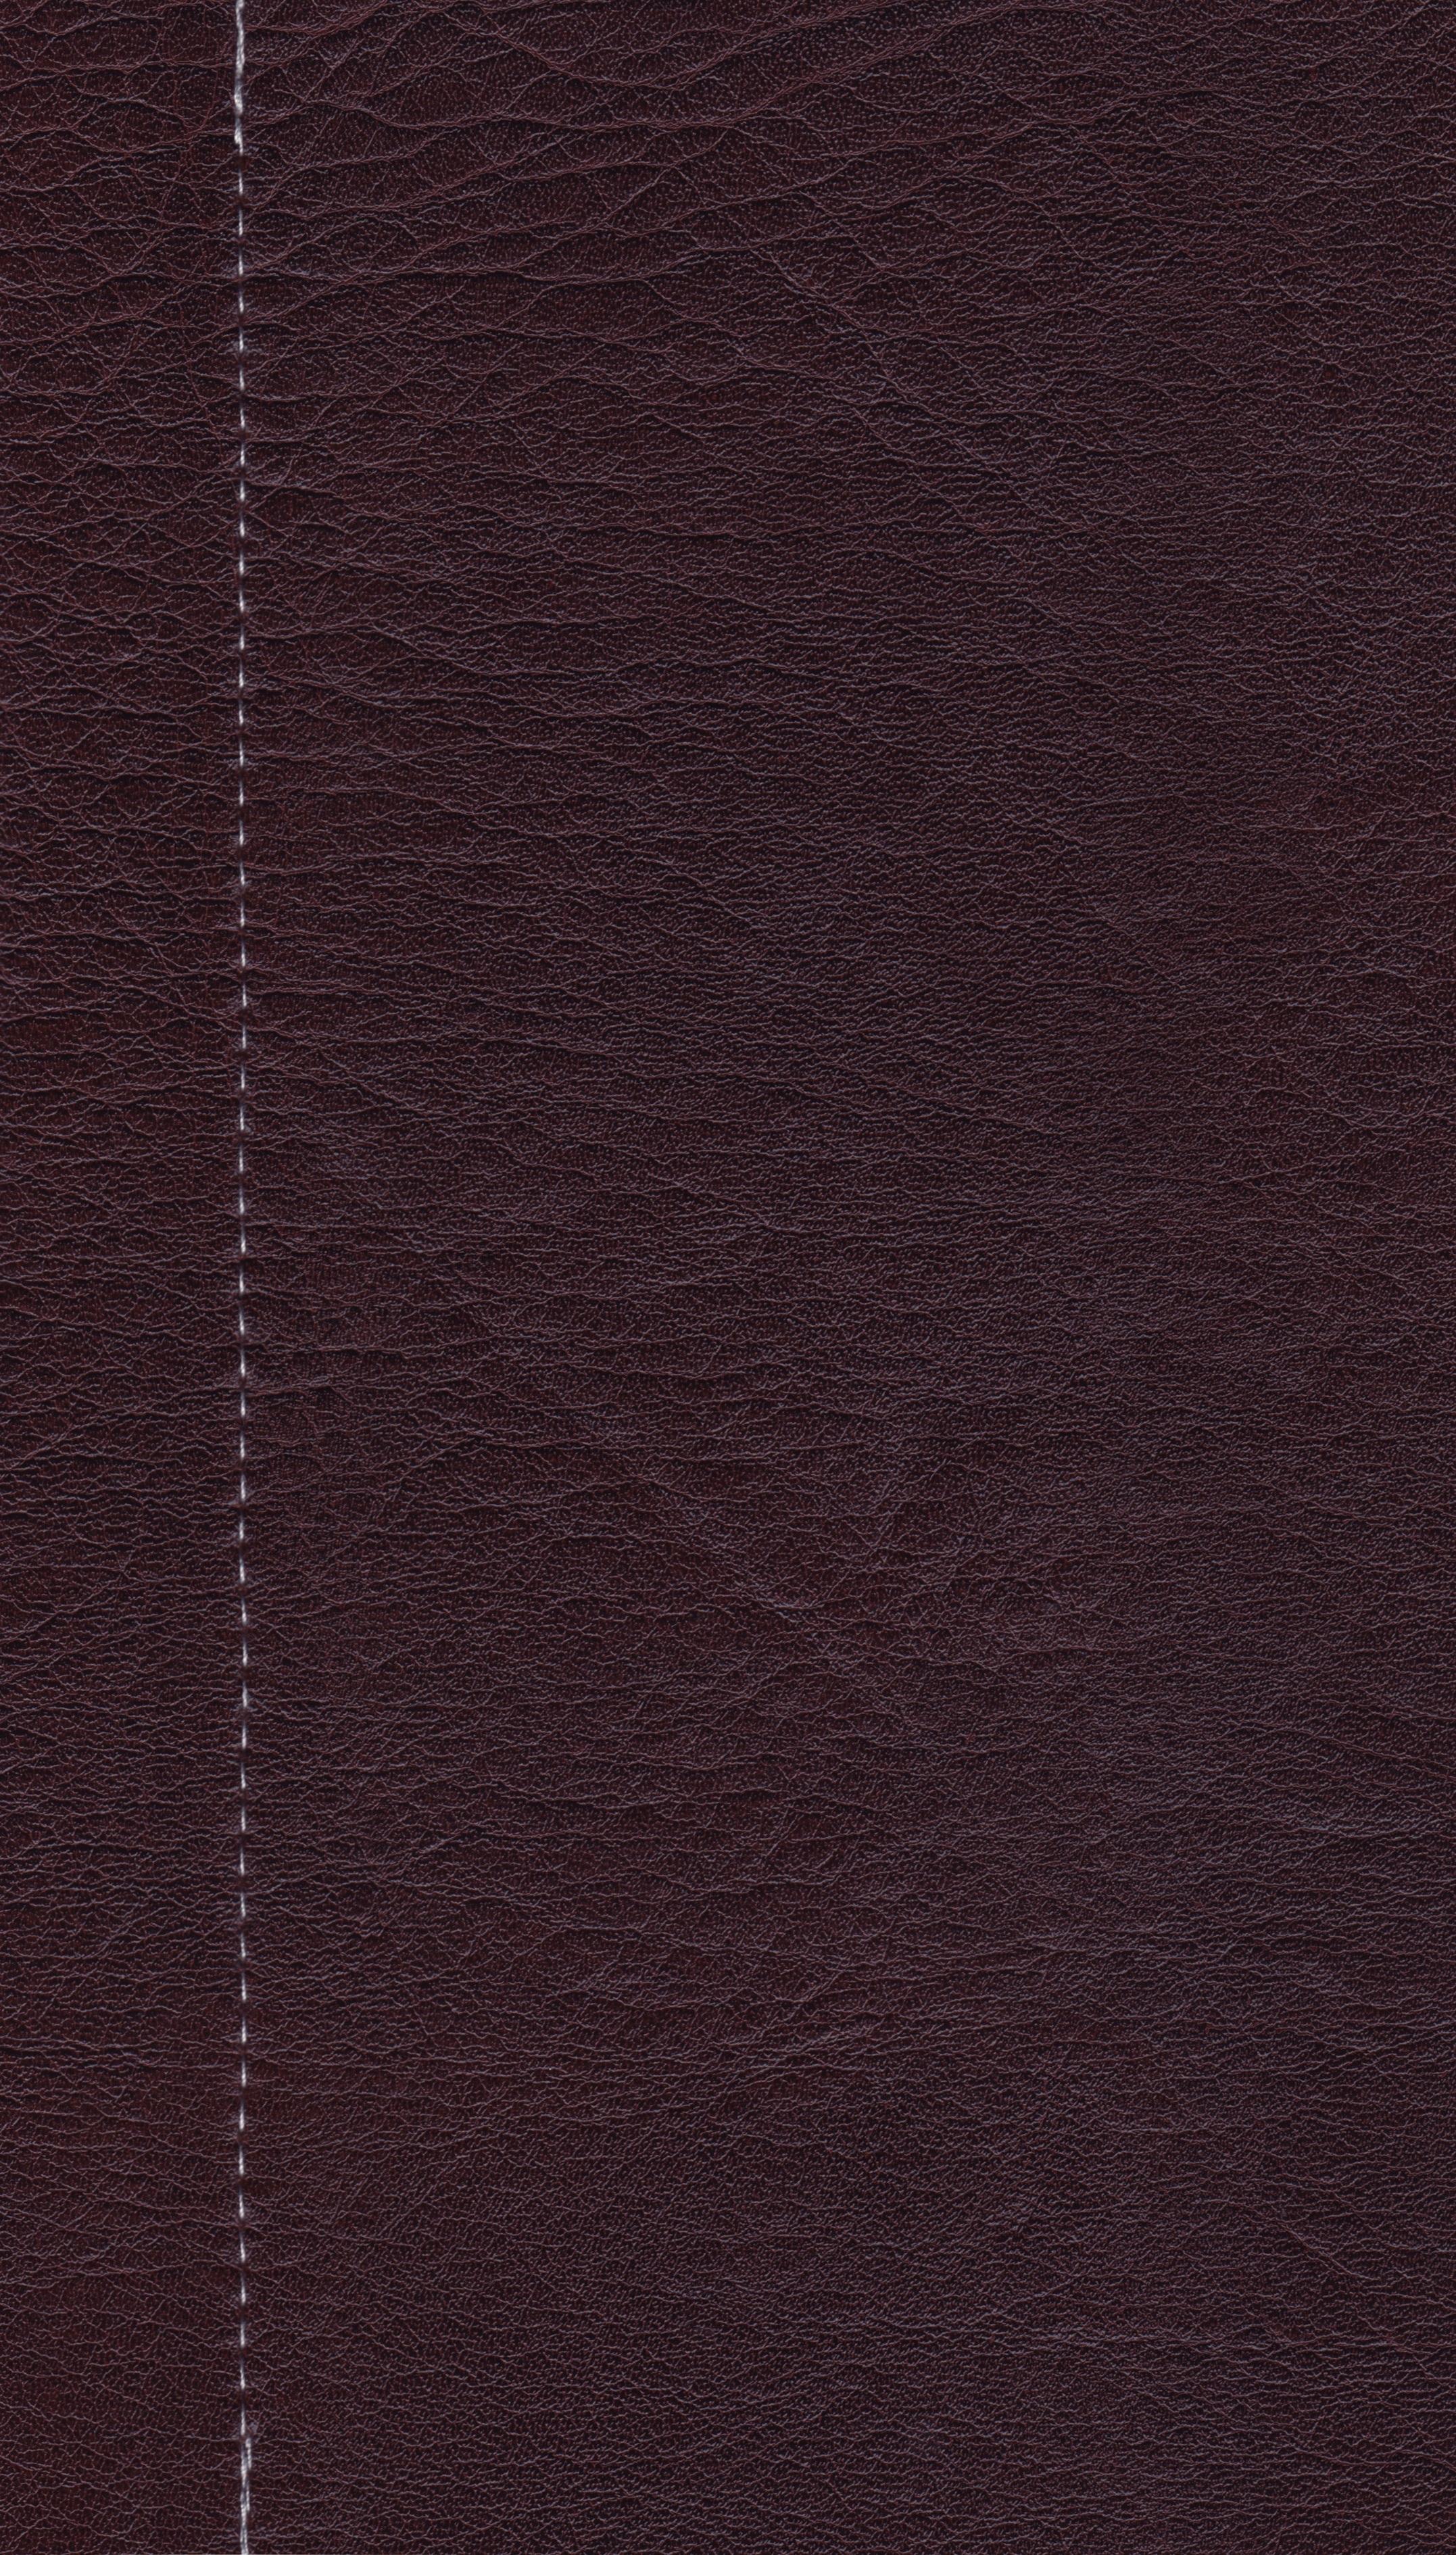 Free Images Creative Leather Floor Dark Fur Pattern